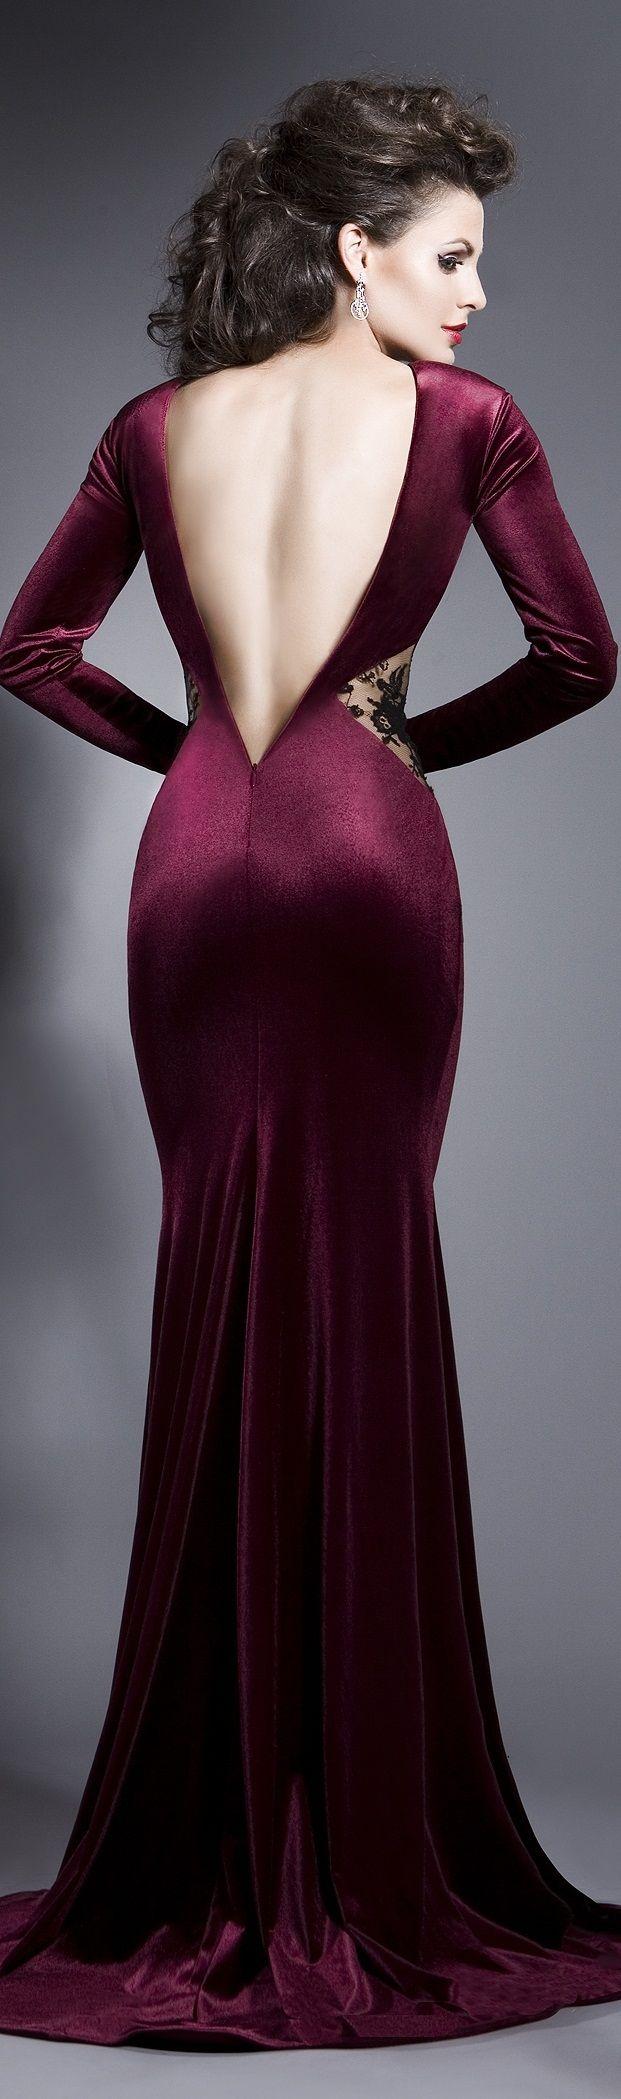 The color maroon purple dress